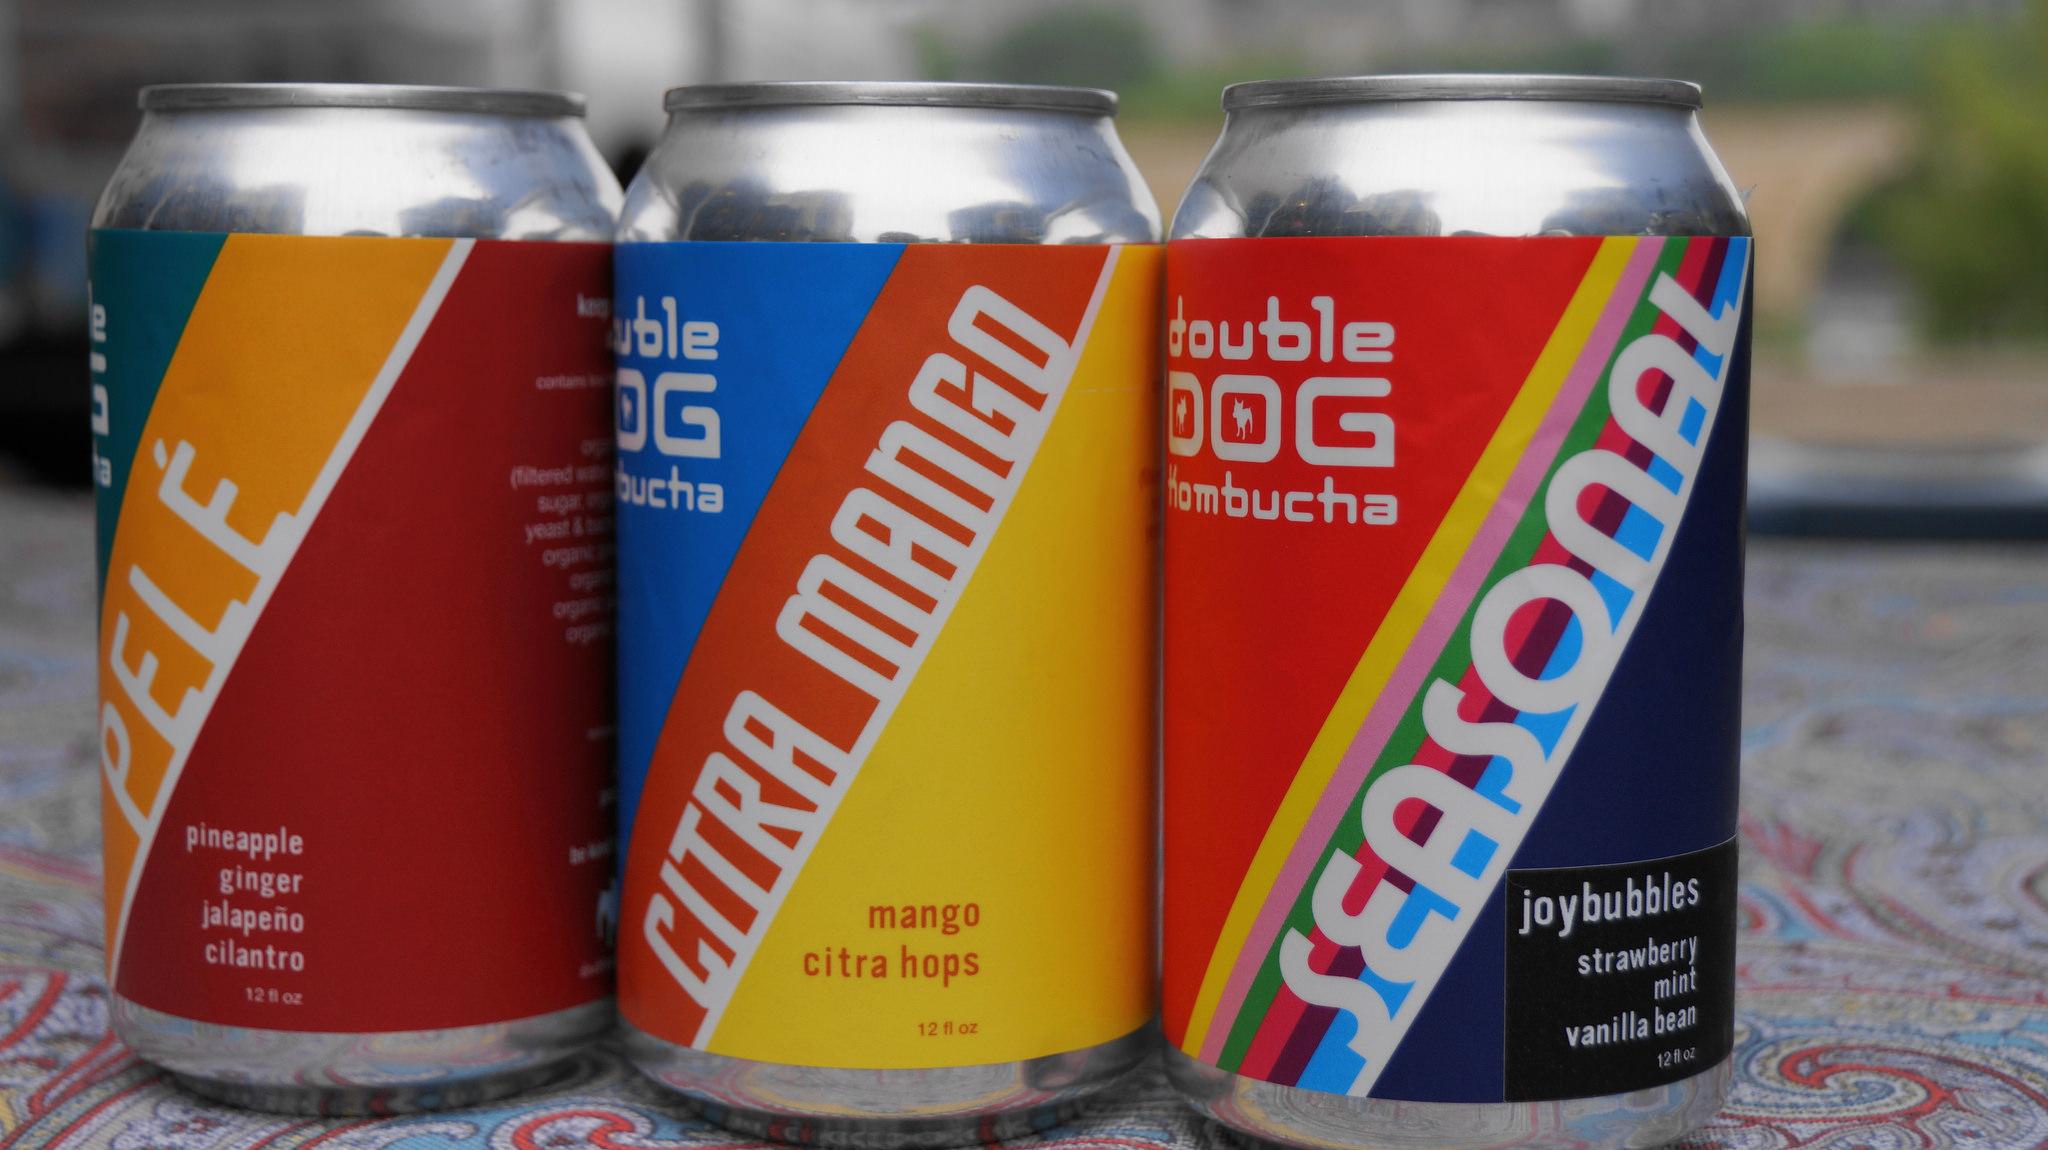 Double Dog Kombucha 3 cans